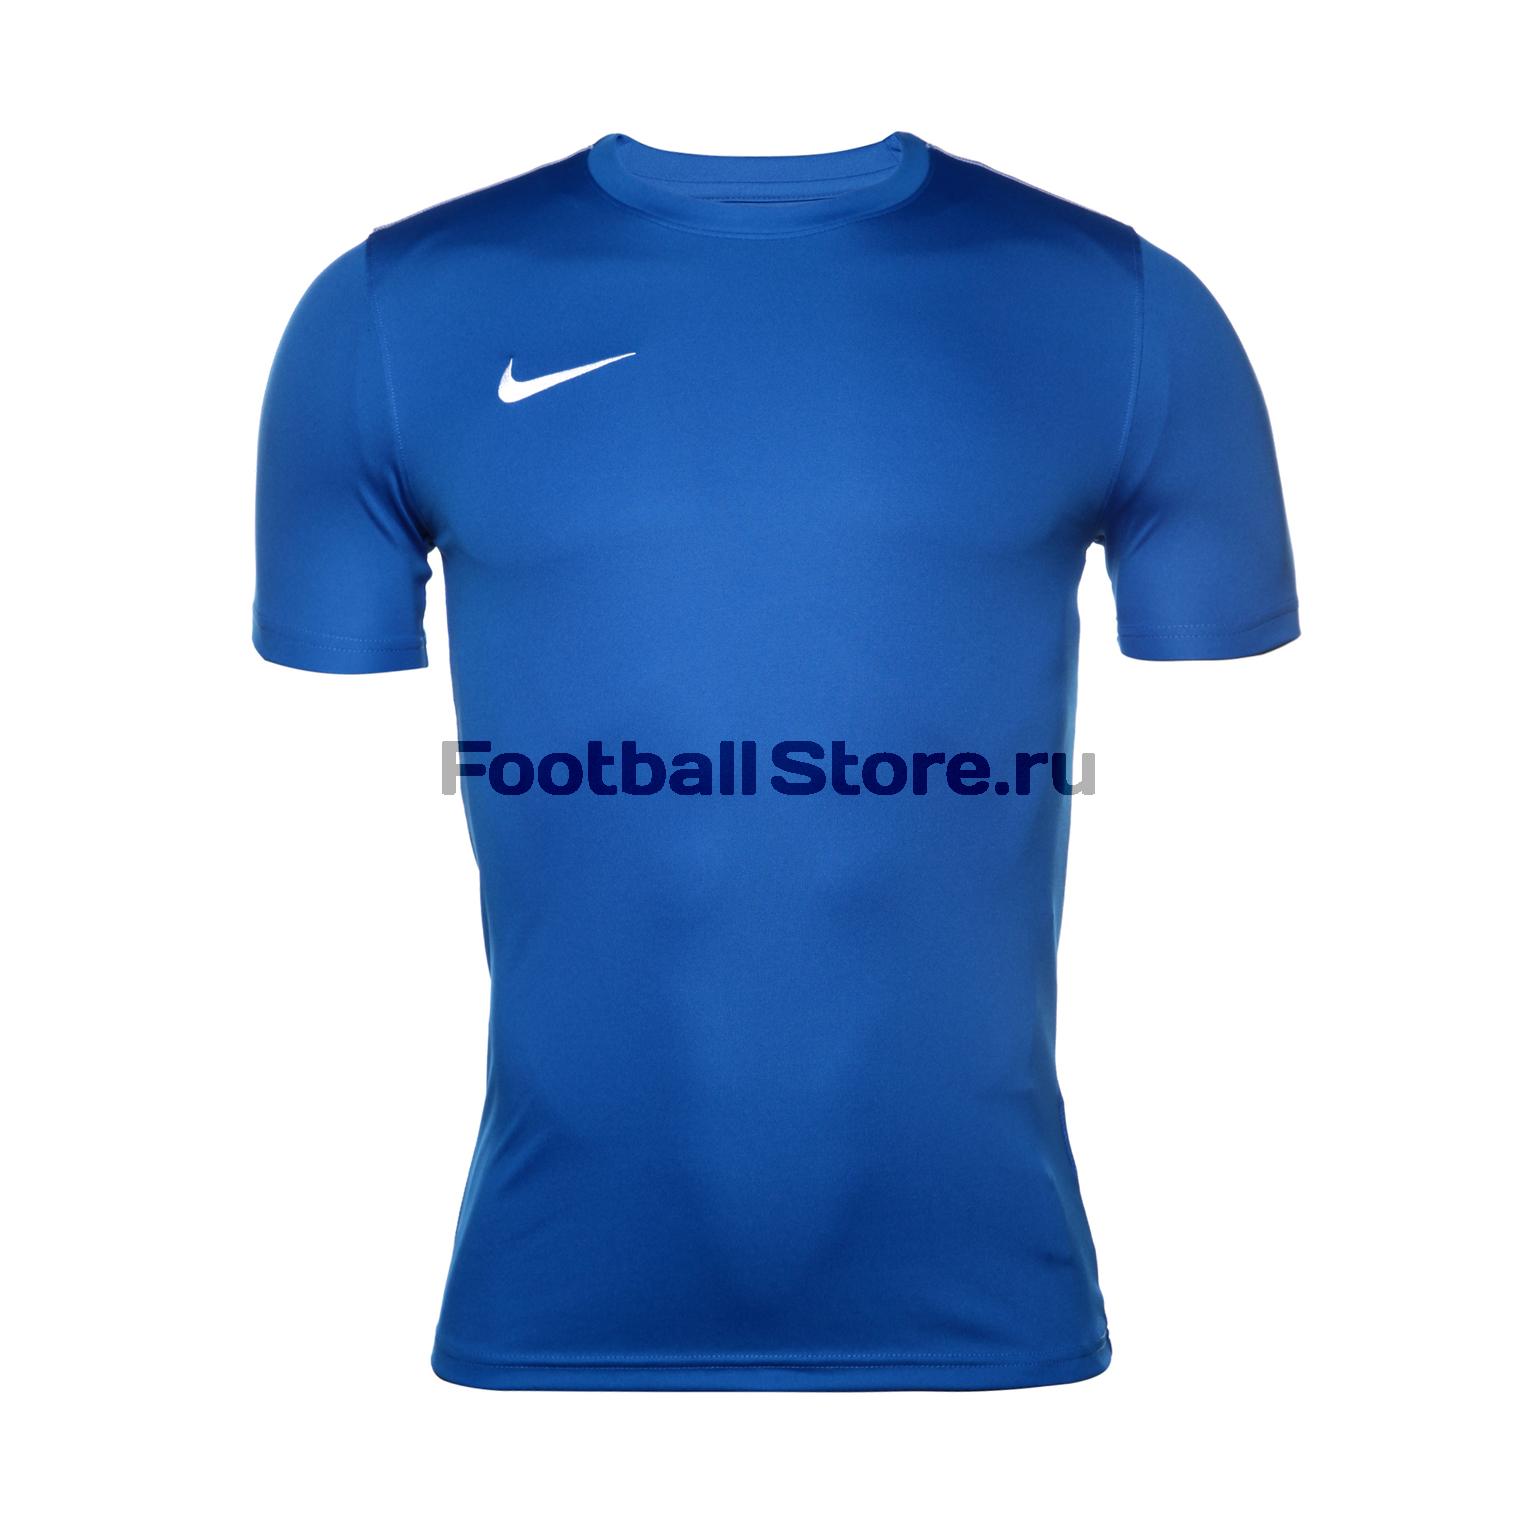 Футболка тренировочная Nike Dry Park18 SS Top AA2046-463 футболка игровая nike dry tiempo prem jsy ss 894230 411